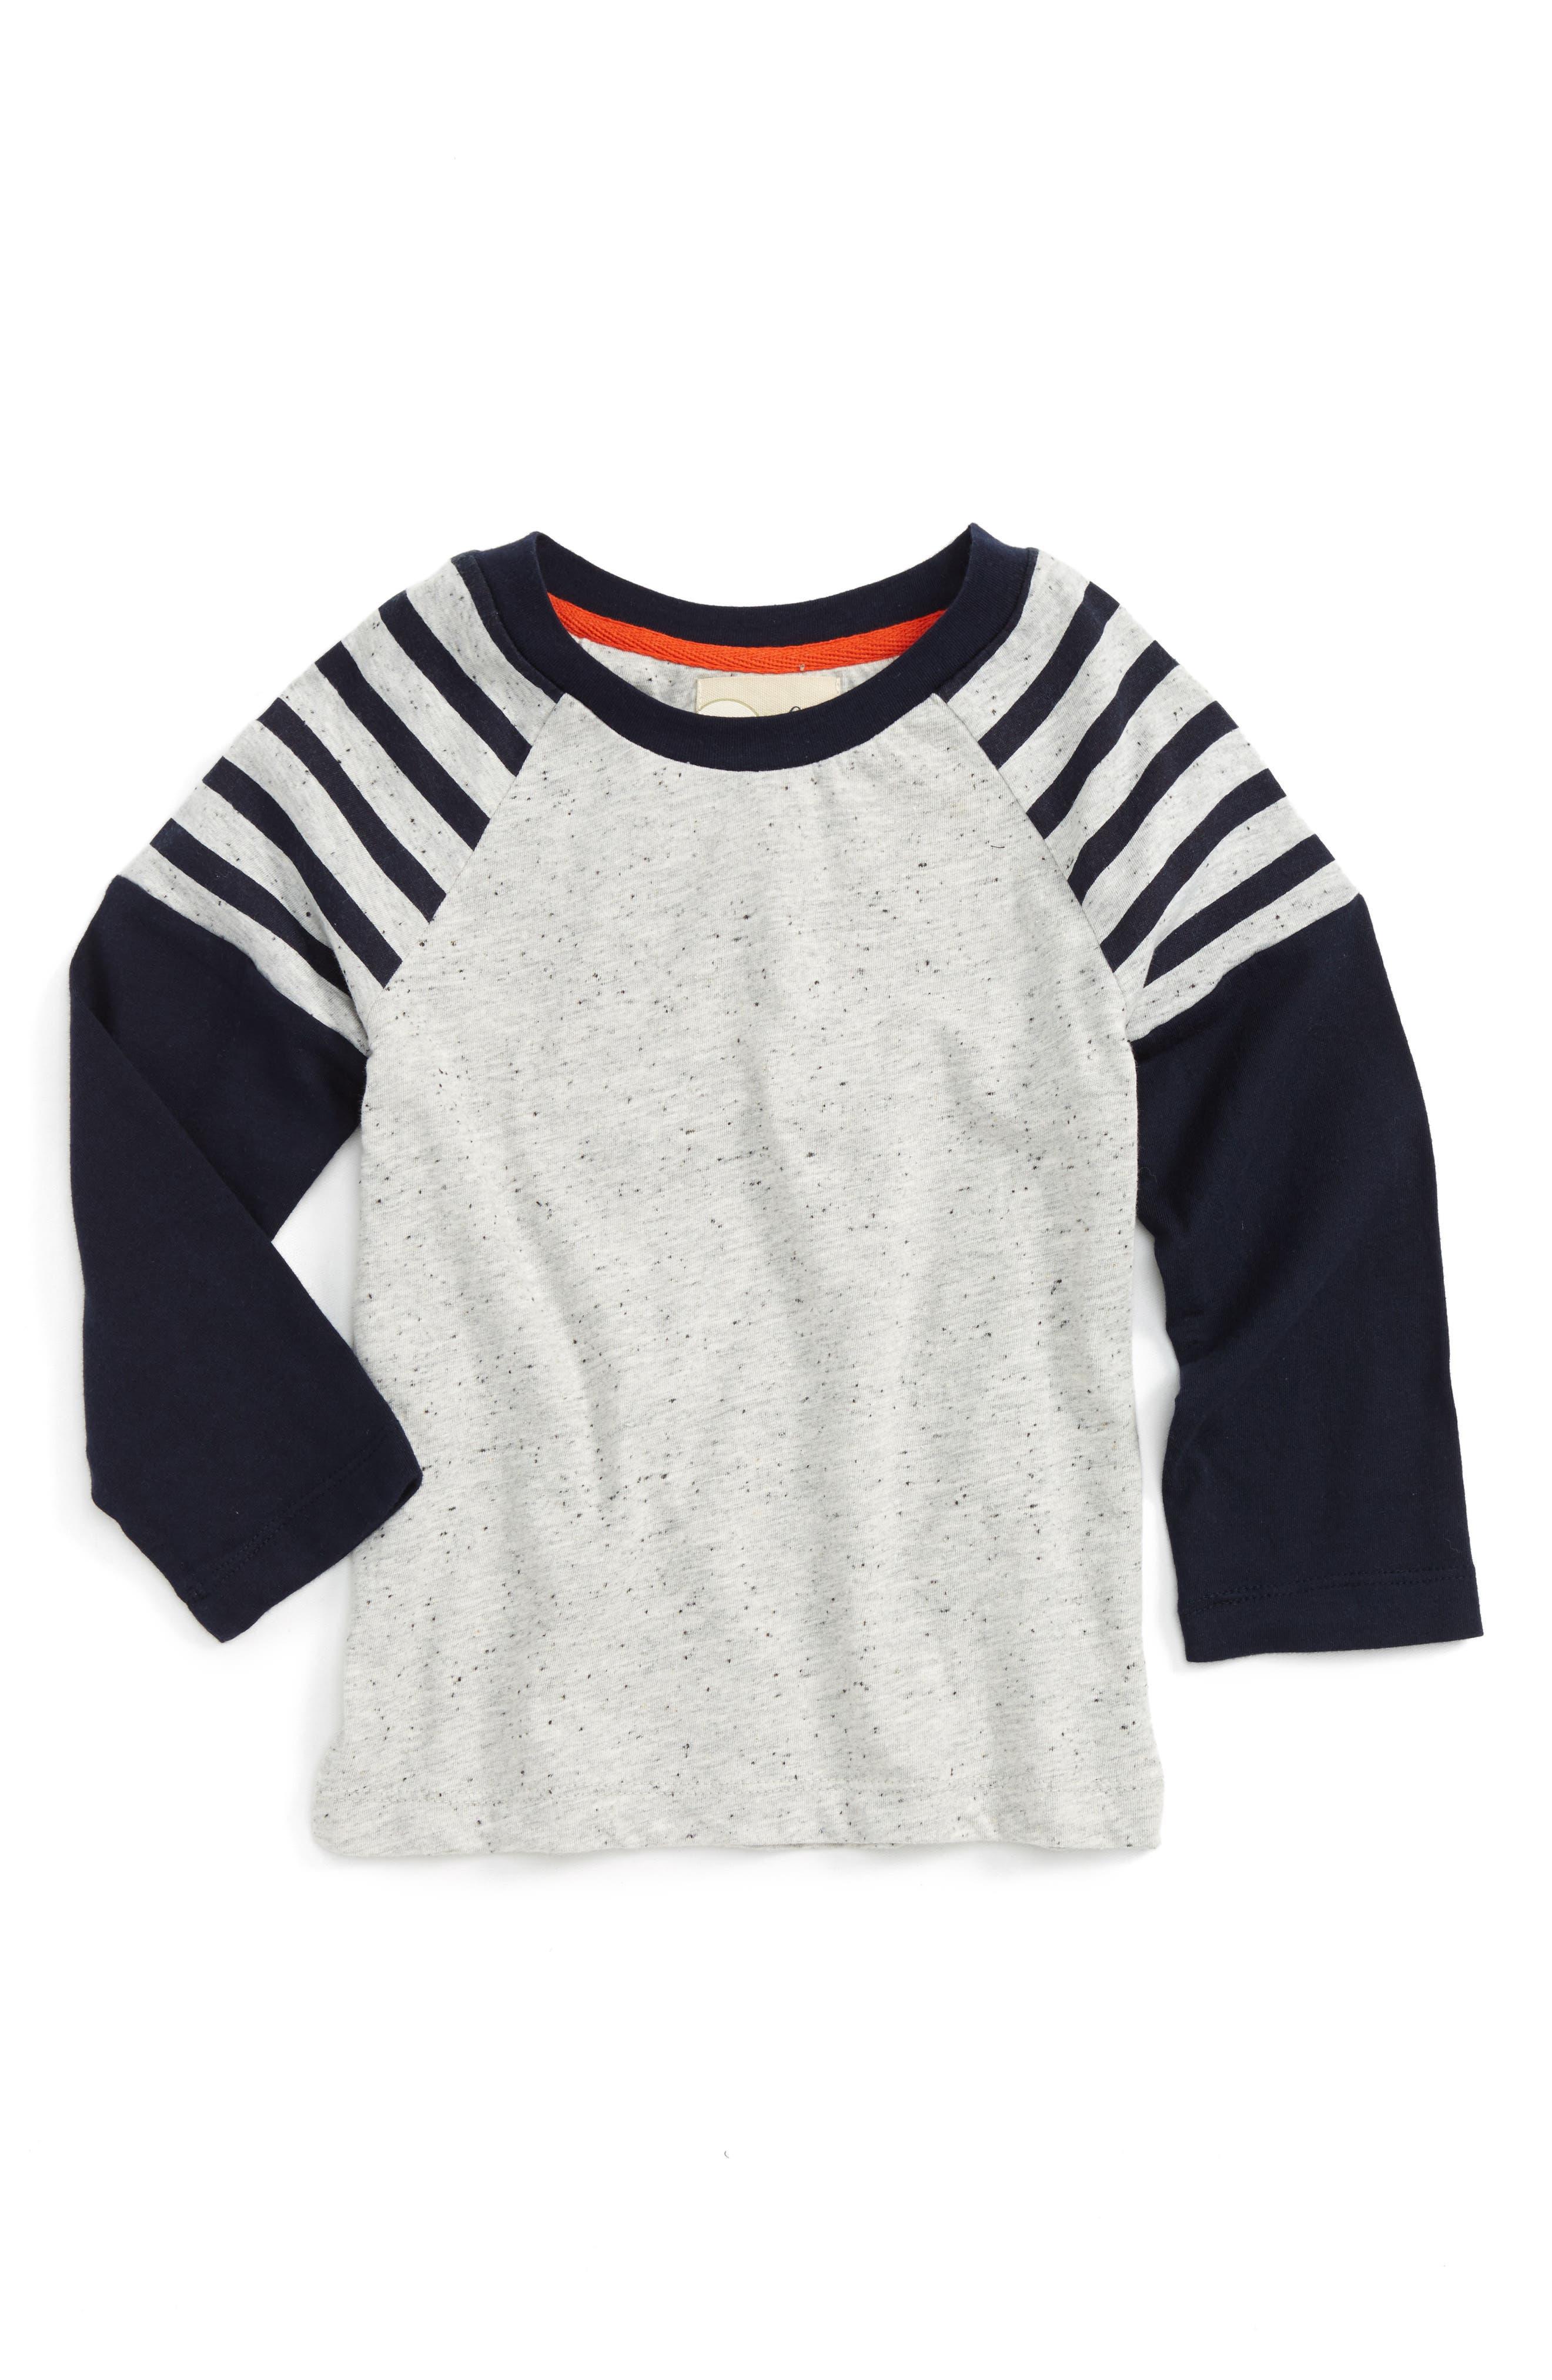 Main Image - Peek Stripe Raglan Sleeve T-Shirt (Toddler Boys, Little Boys & Big Boys)